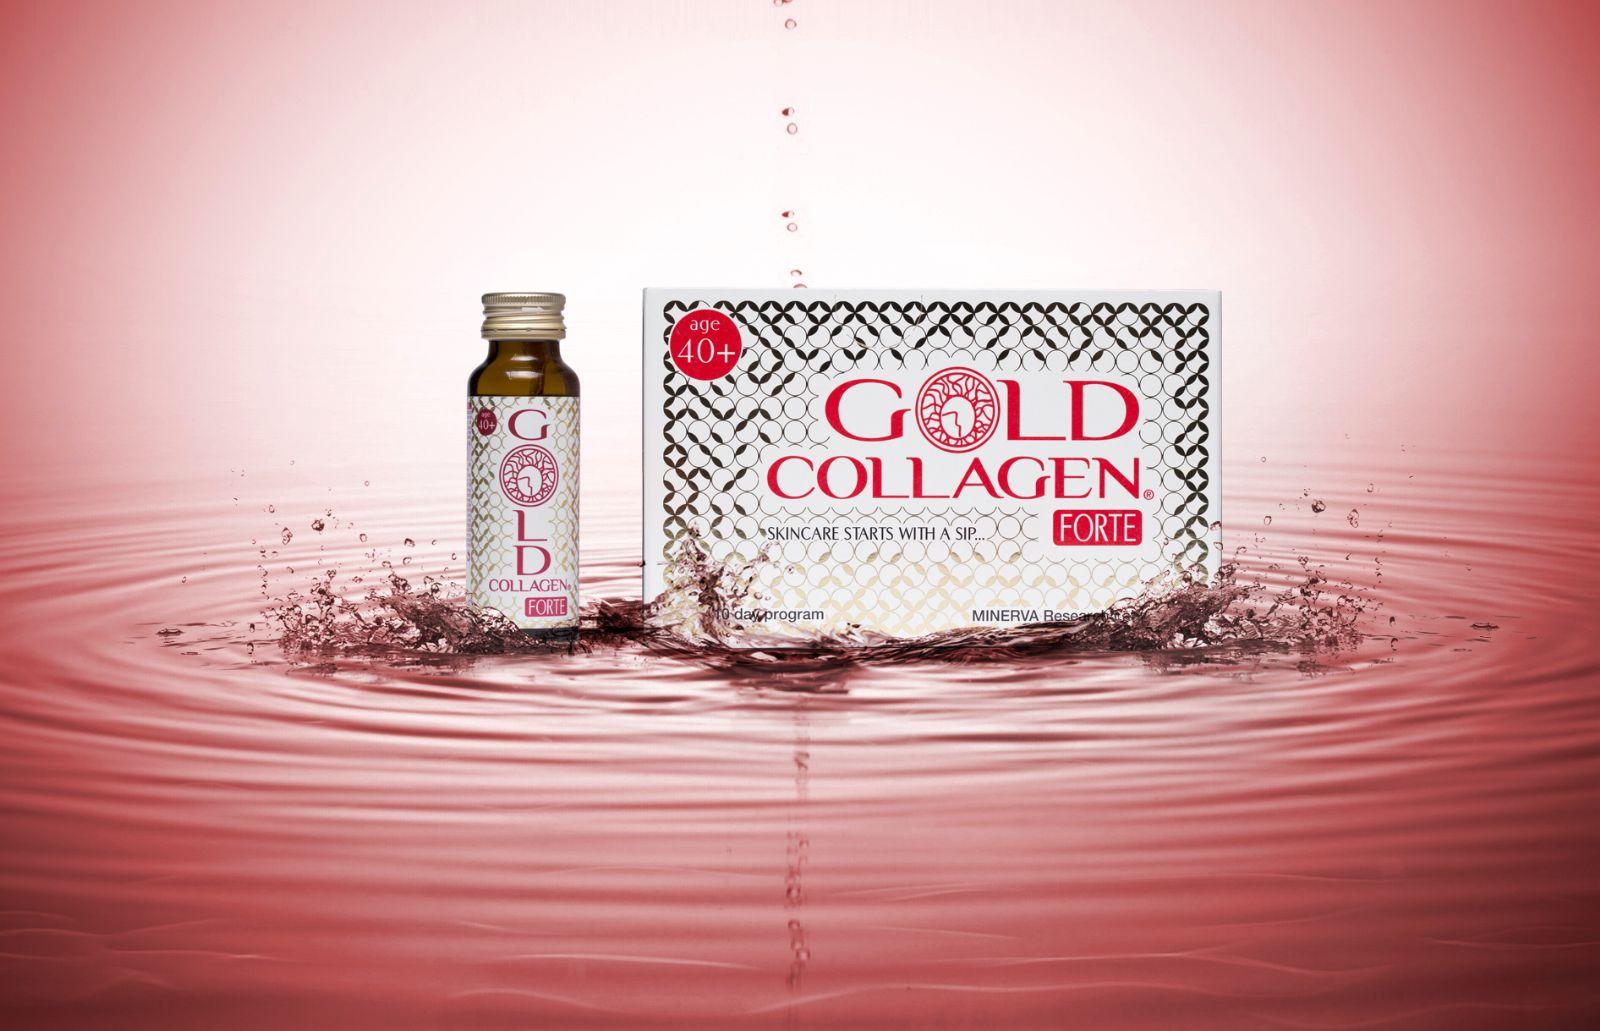 Nước uống gold collagen forte 3